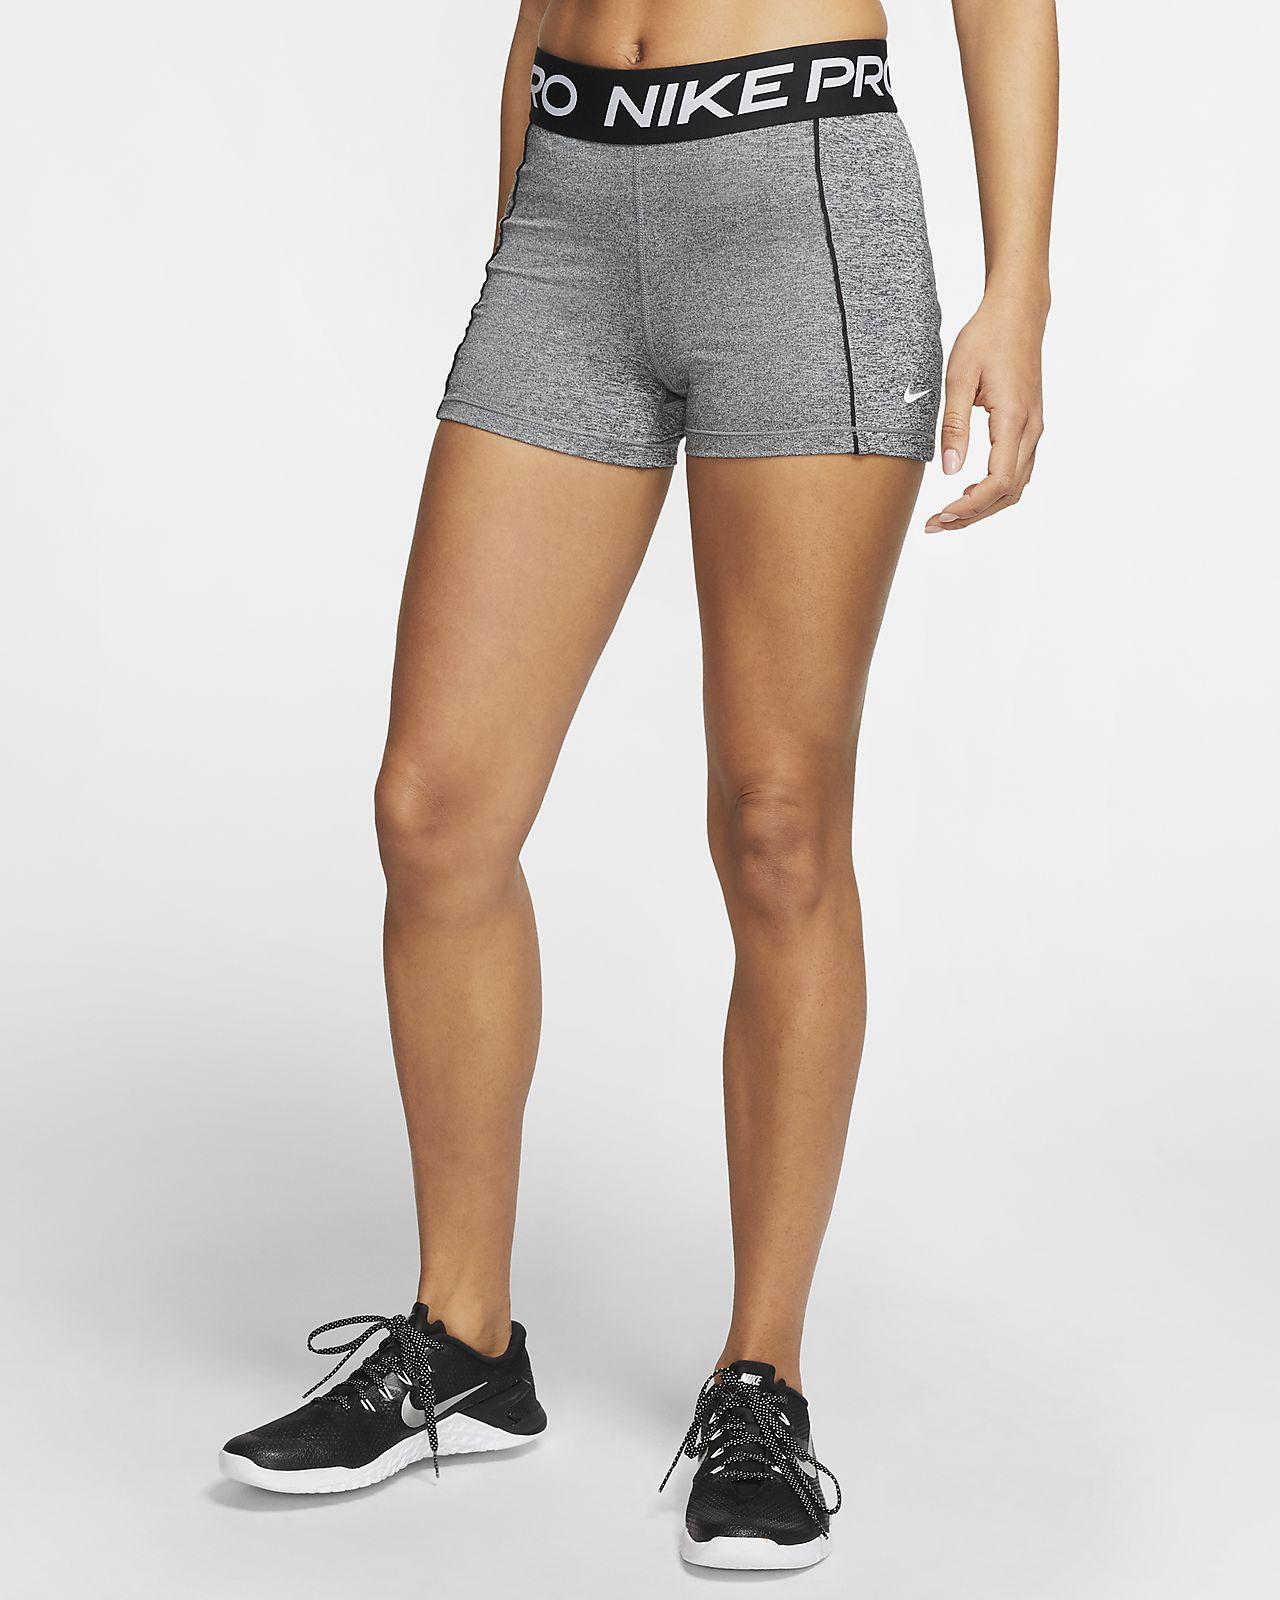 Shorts de 7,5 cm para mujer Nike Pro